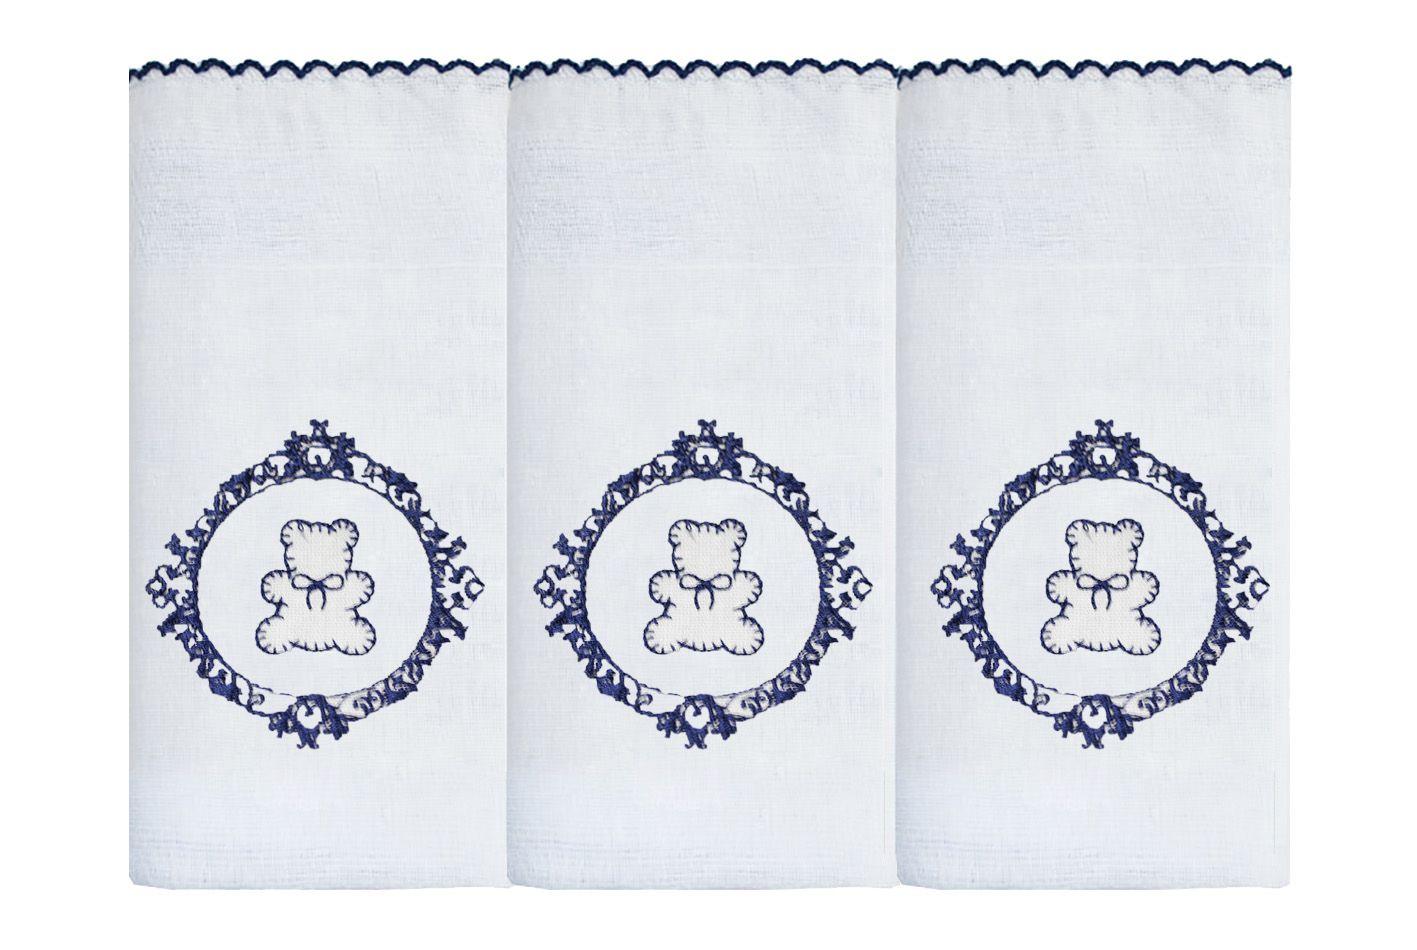 Fralda de Ombro Bord. 03 Pçs - Urso Arabesco Branco